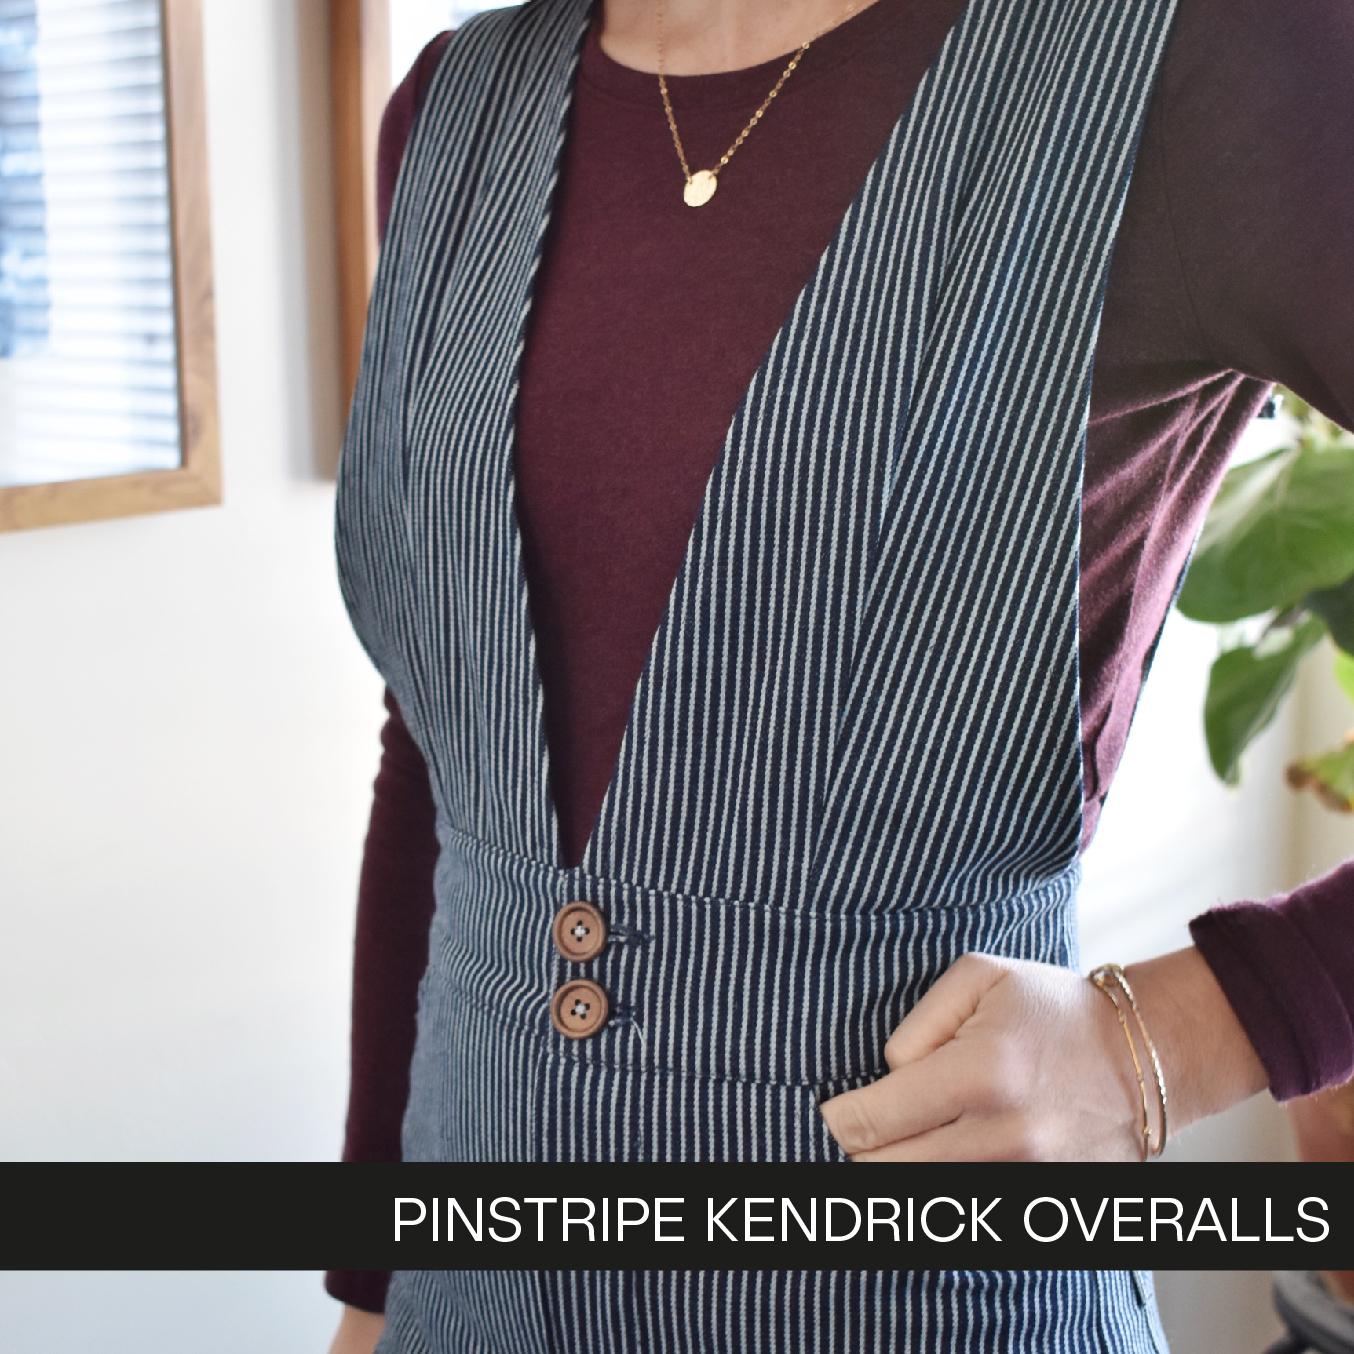 f7d6774f Pinstripe Kendrick Overalls - Hey June Handmade